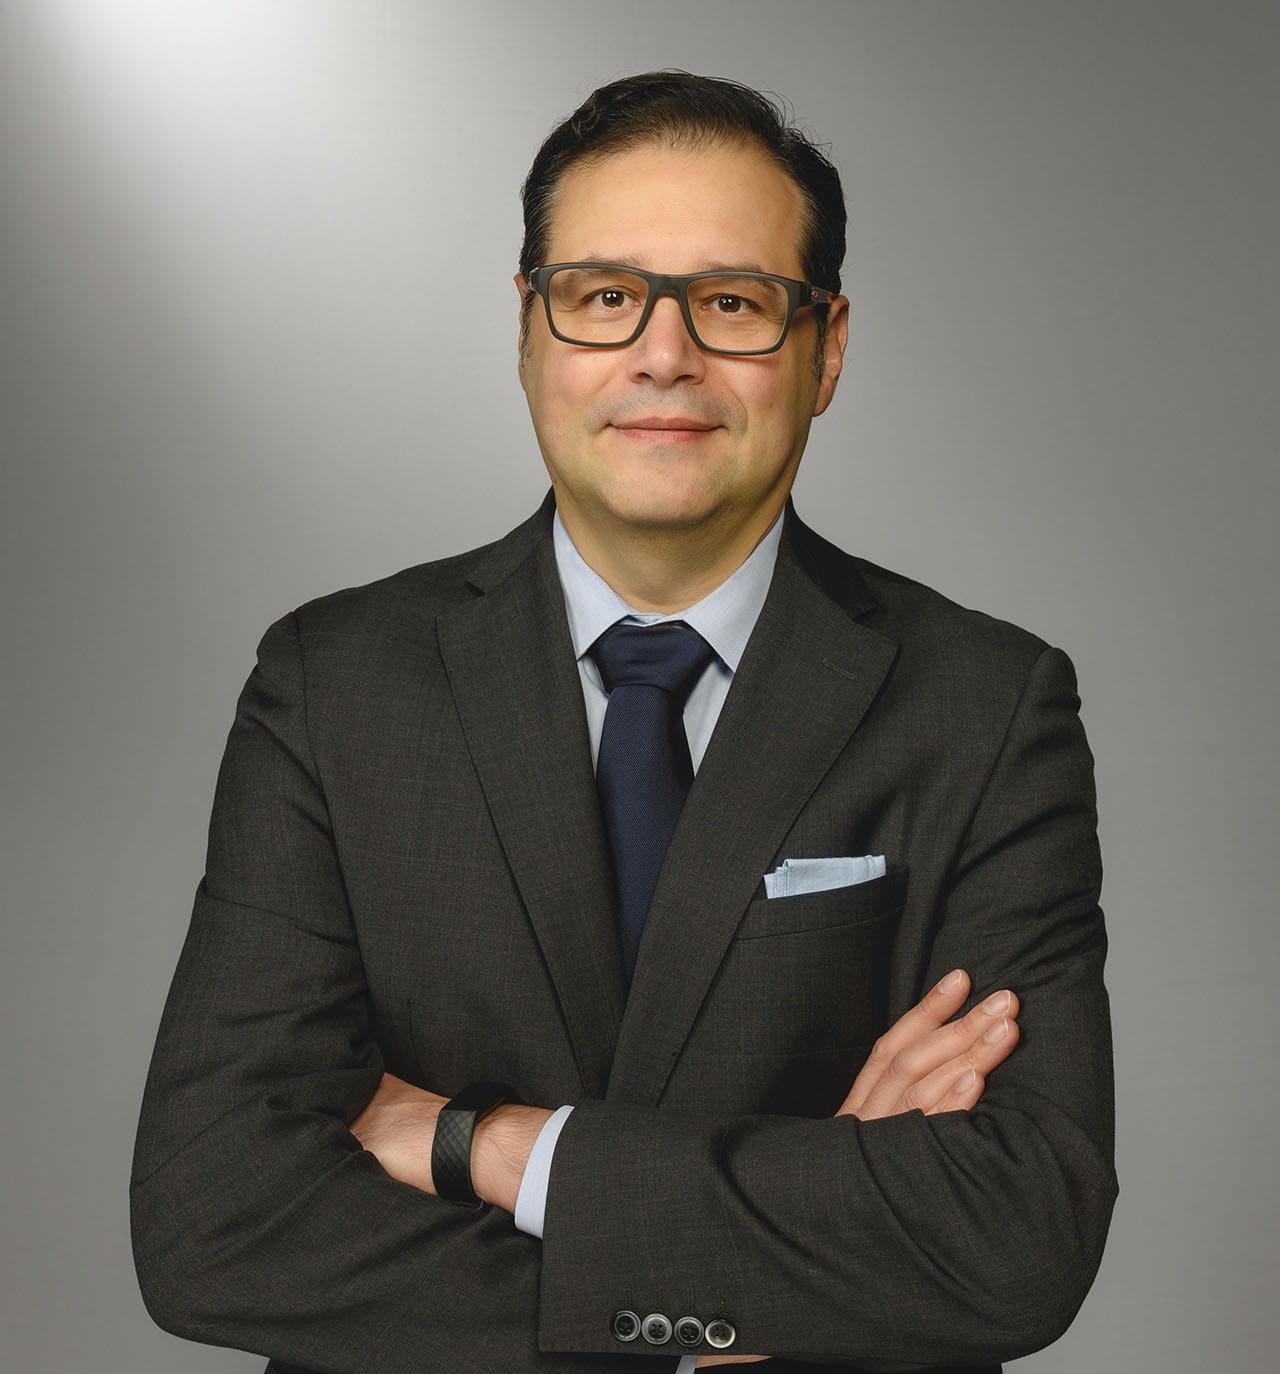 Luca Maddalena, a professor of mechanical and aerospace engineering at The University of Texas at Arlington